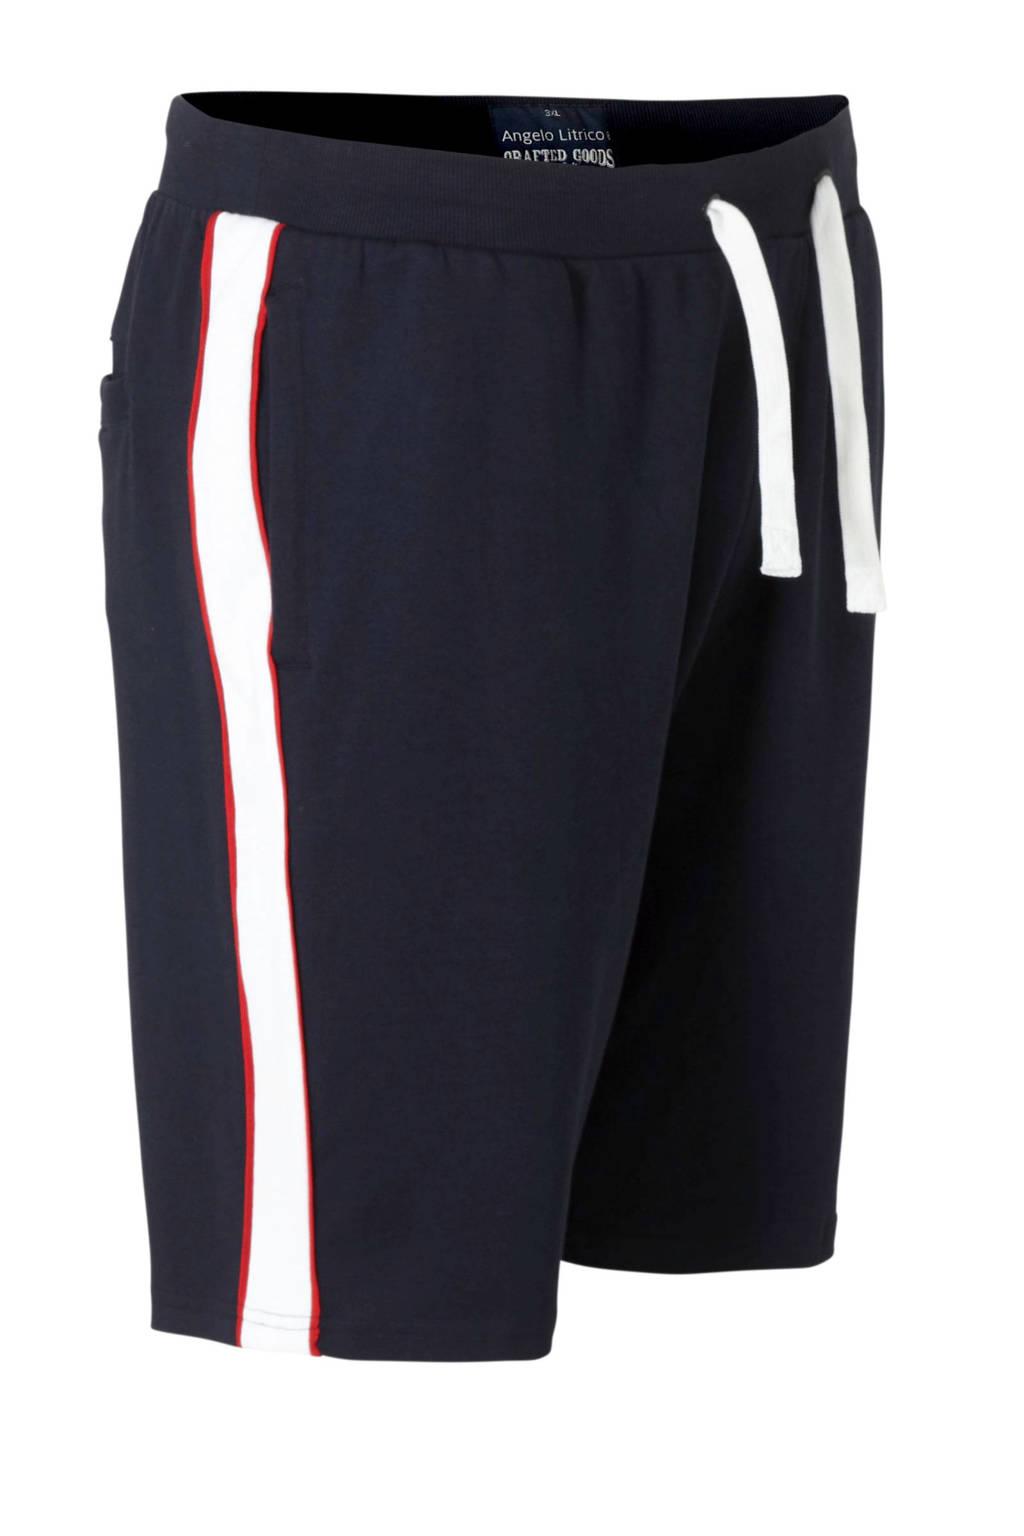 C&A XL Angelo Litrico sweatshort donkerblauw, Donkerblauw/wit/rood